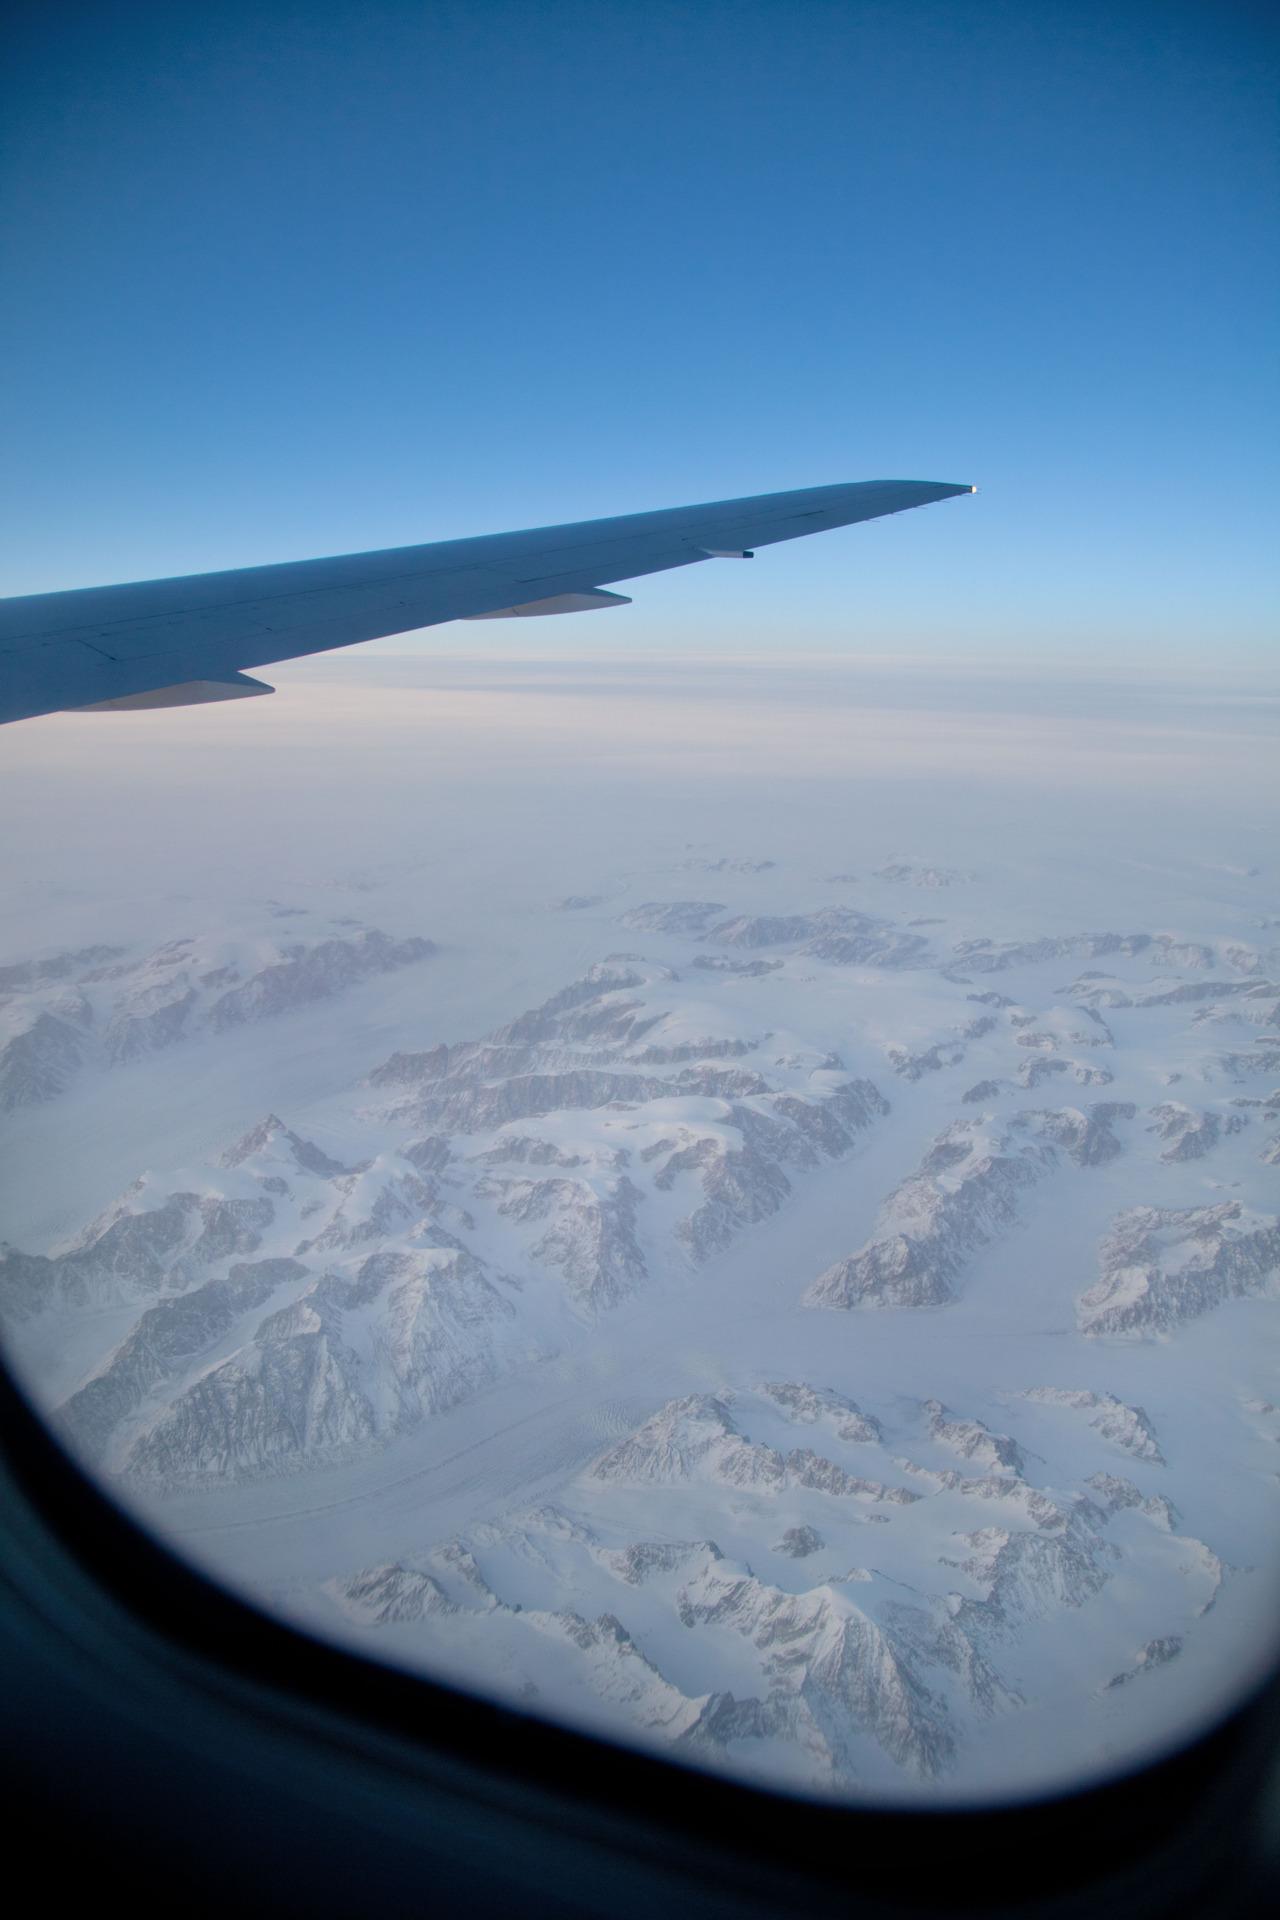 p366, take 26: Greenland